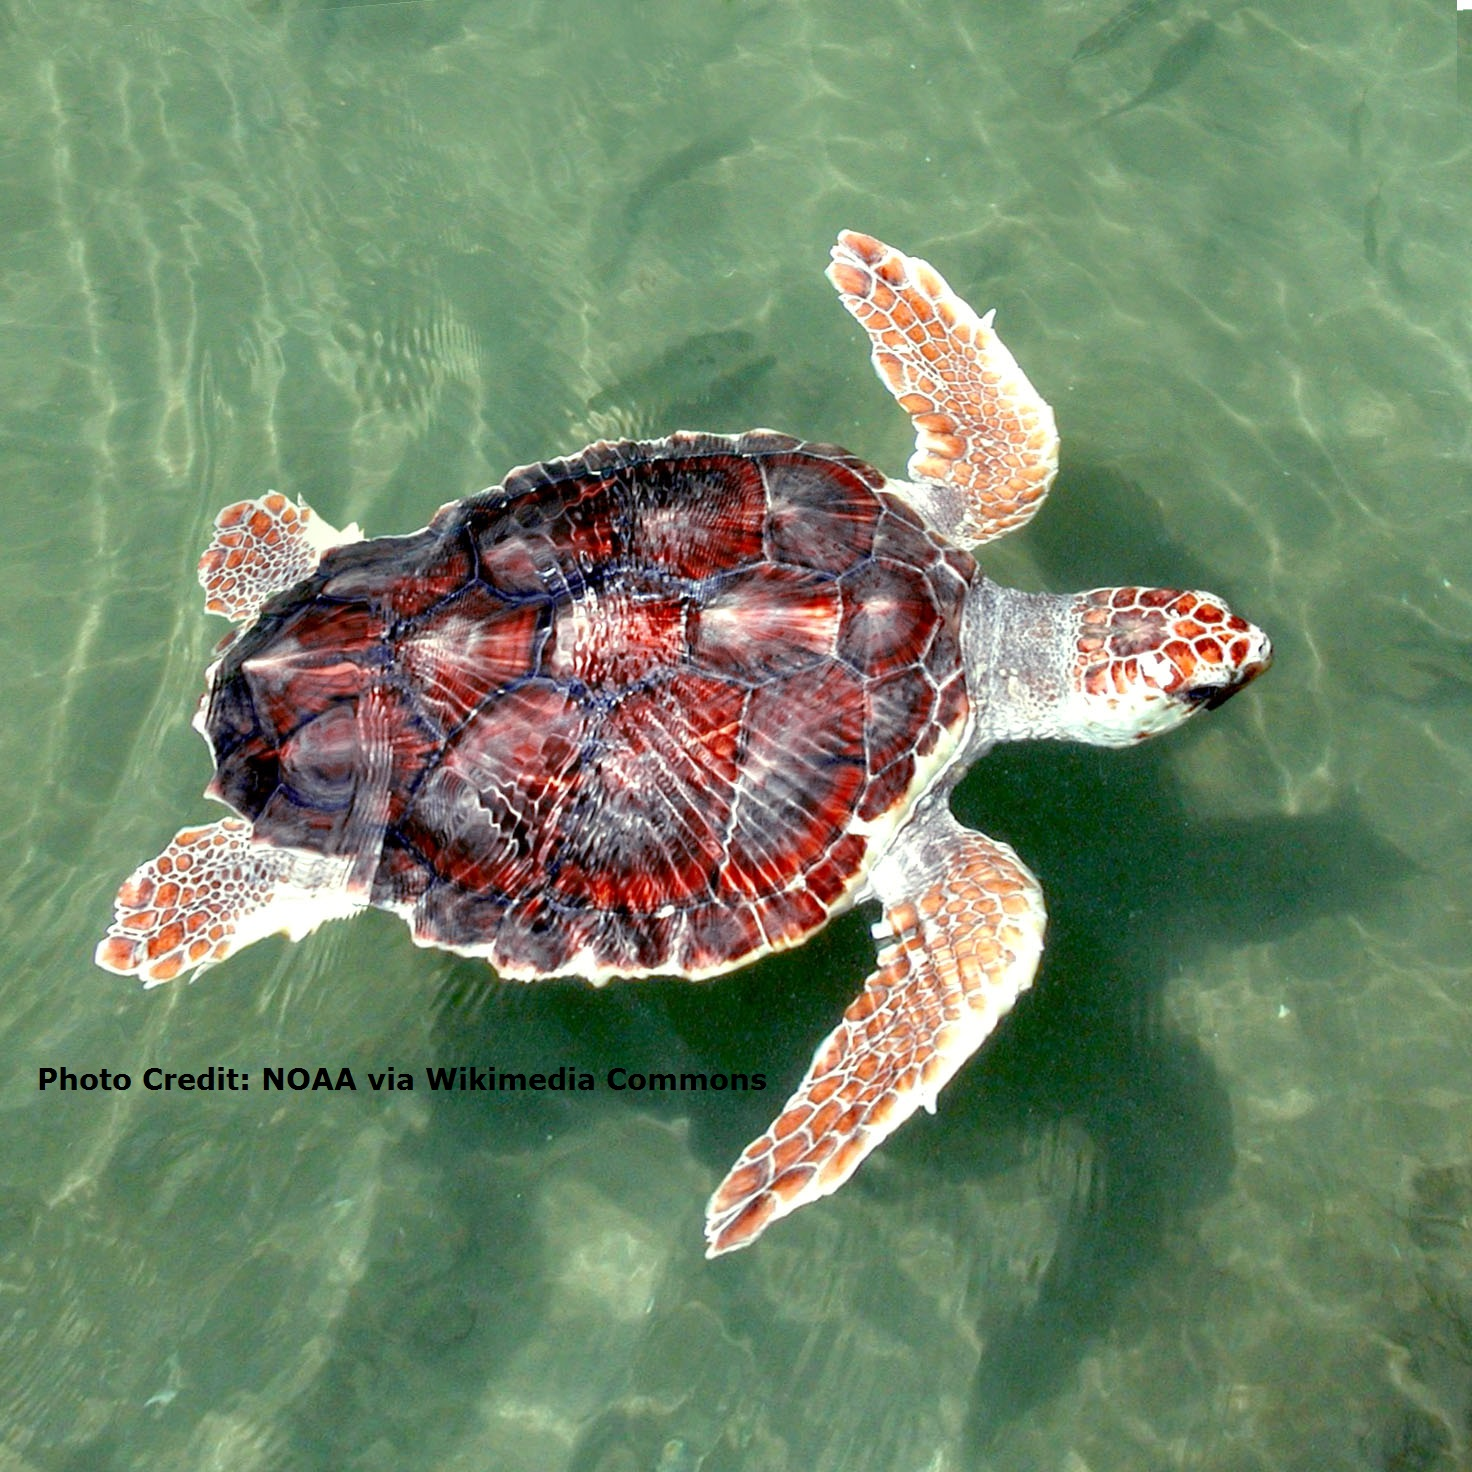 FACT SHEET: Loggerhead Sea Turtles